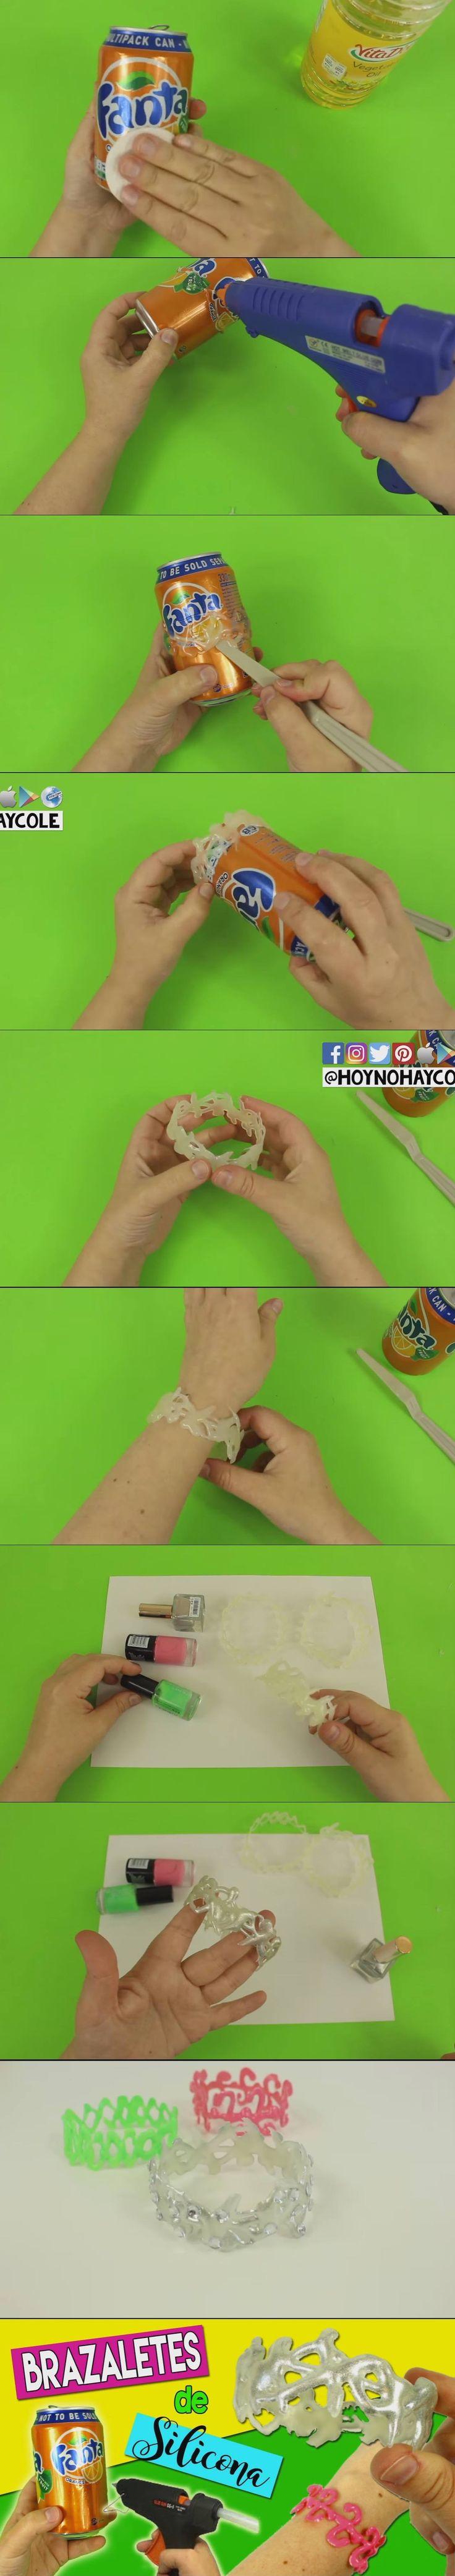 pulseras de silicona